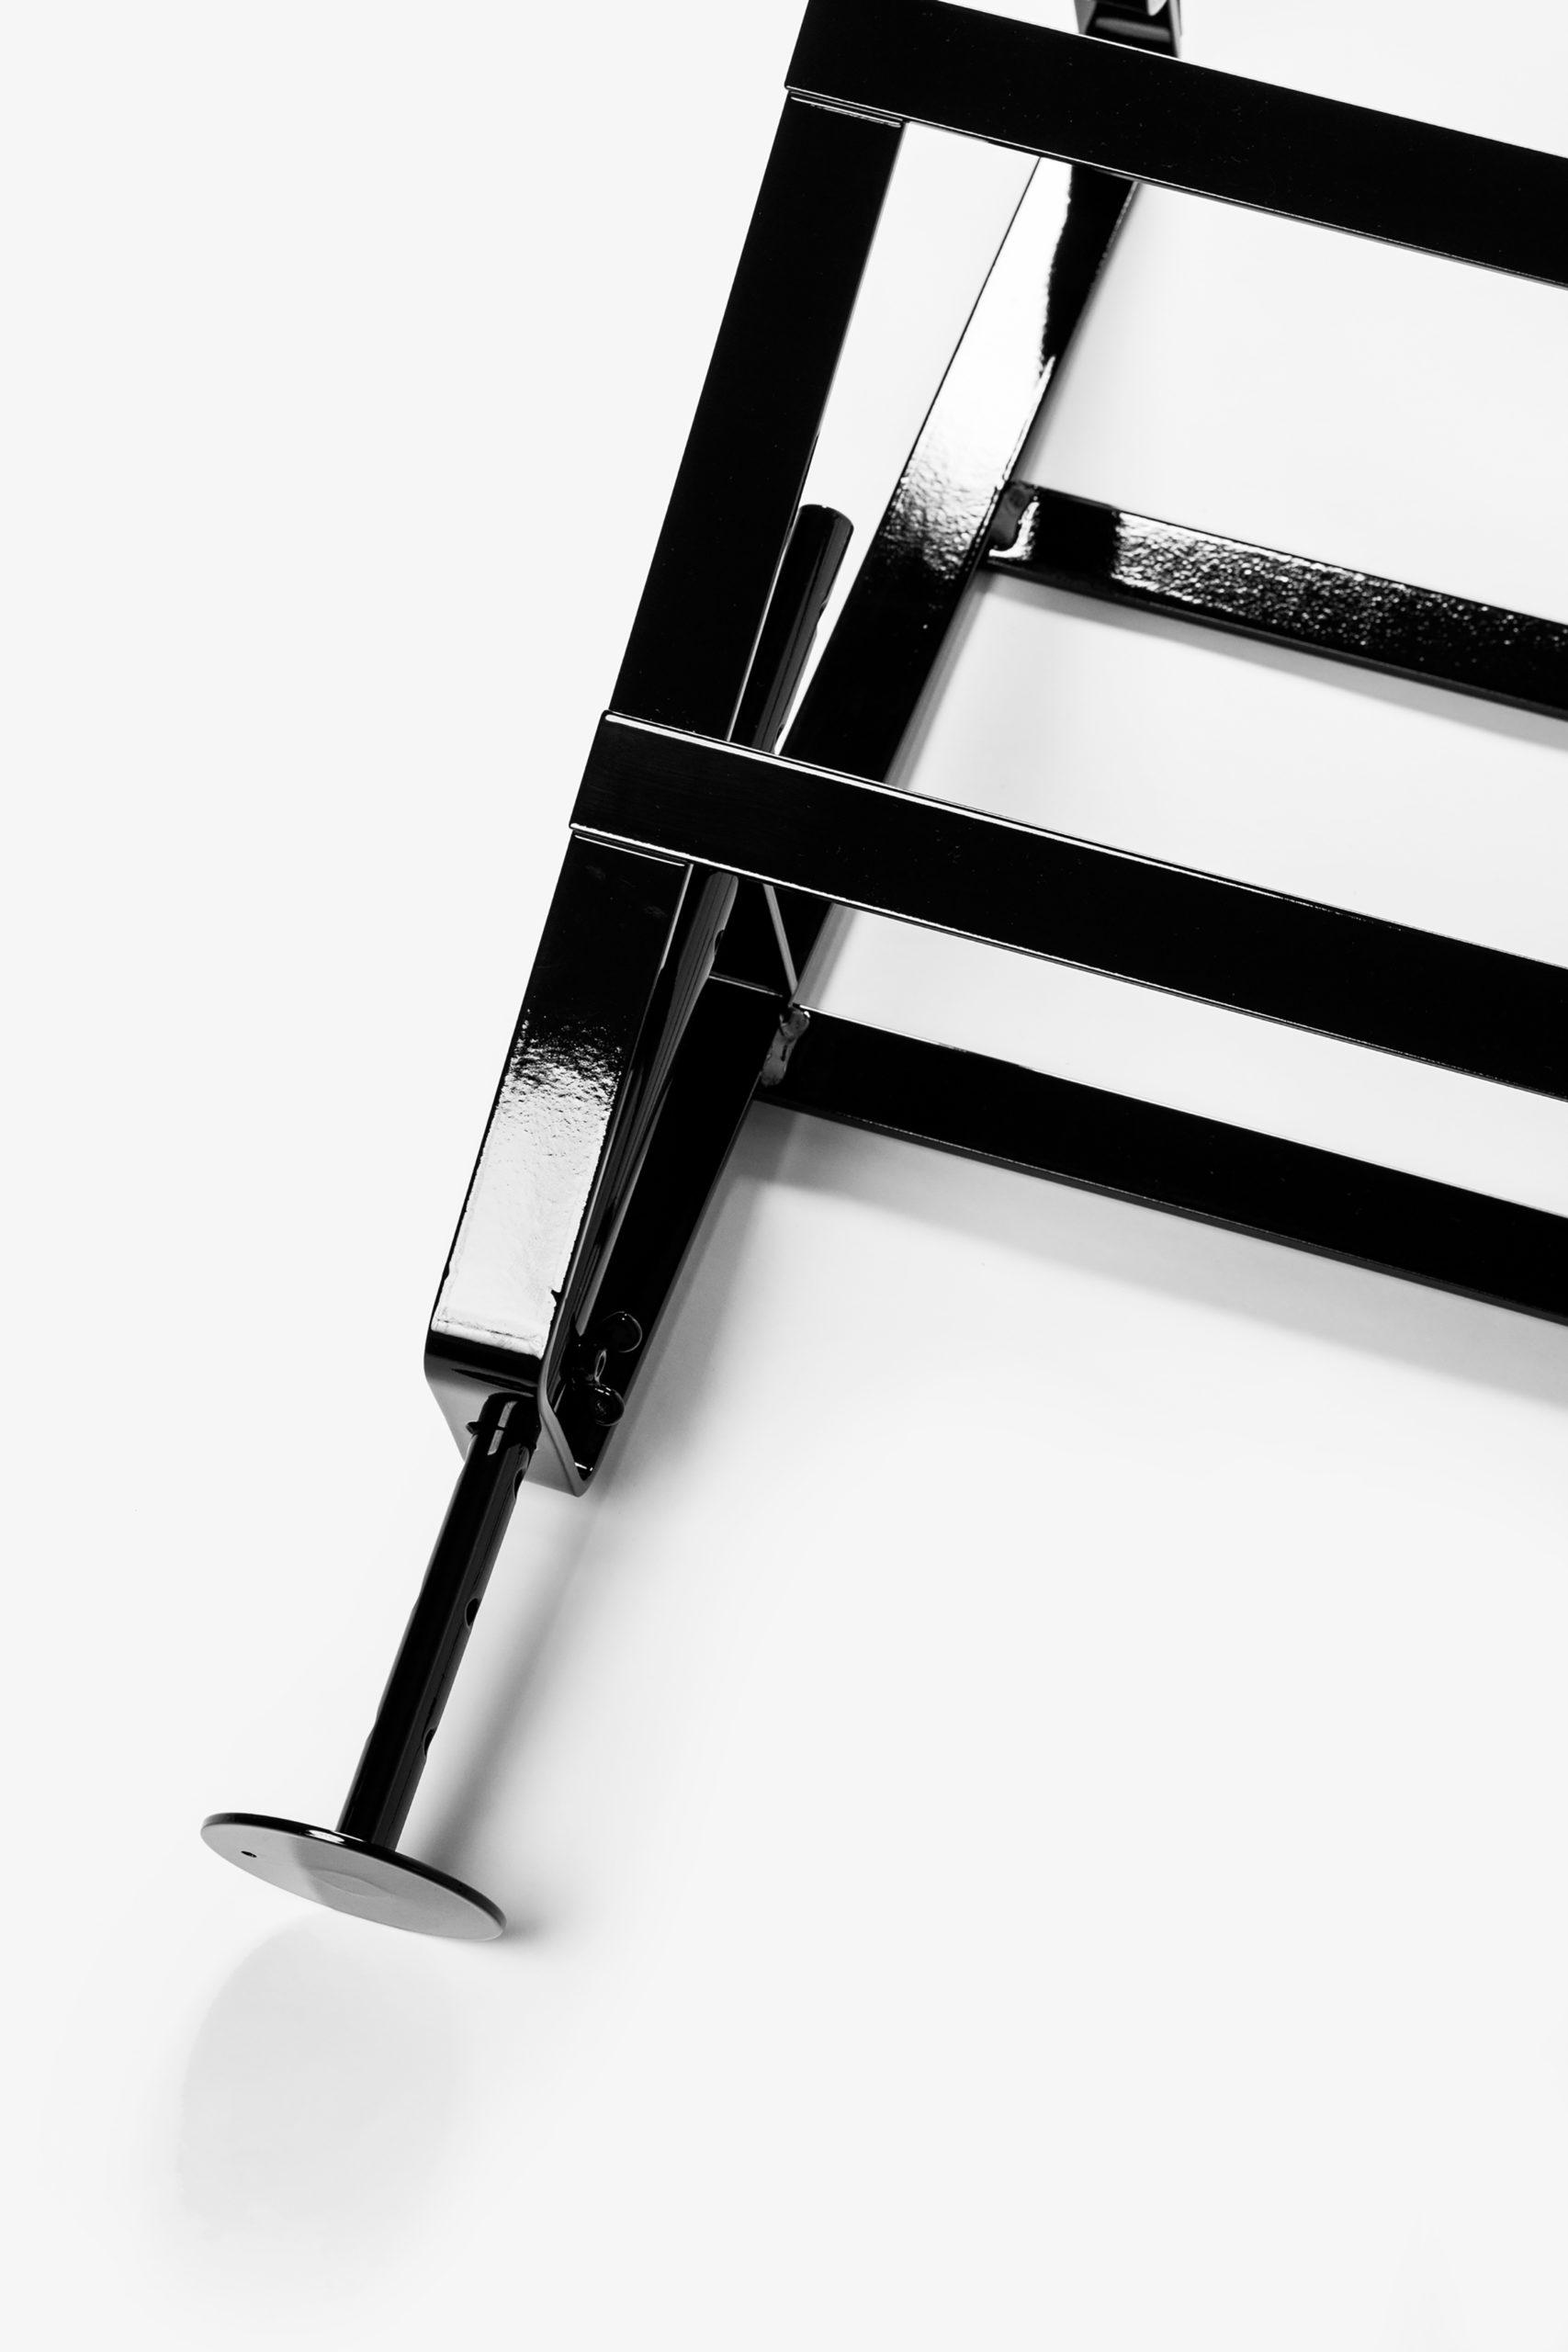 Lackaffe Tischbock Tischgestell Stahl Atelier Haußmann